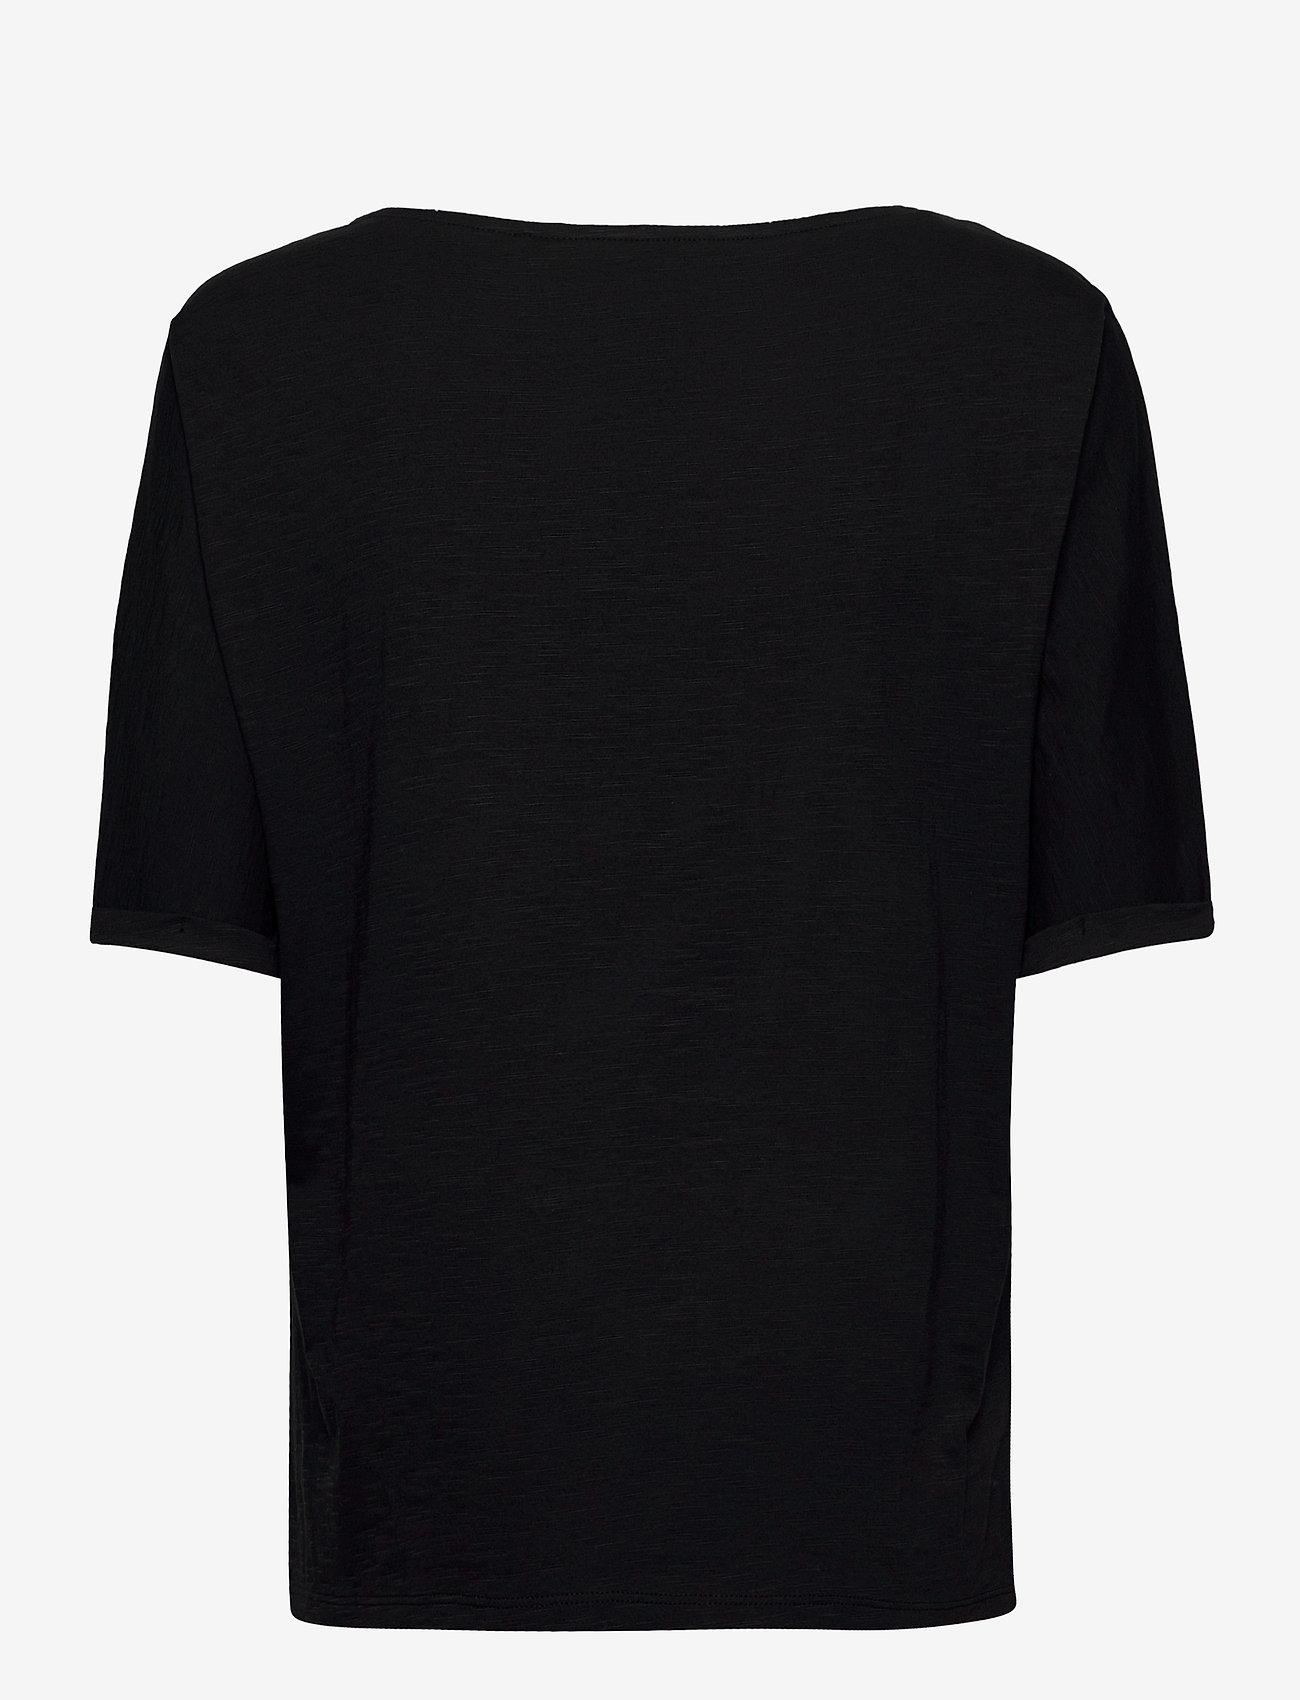 Esprit Casual - T-Shirts - t-shirts - black - 1